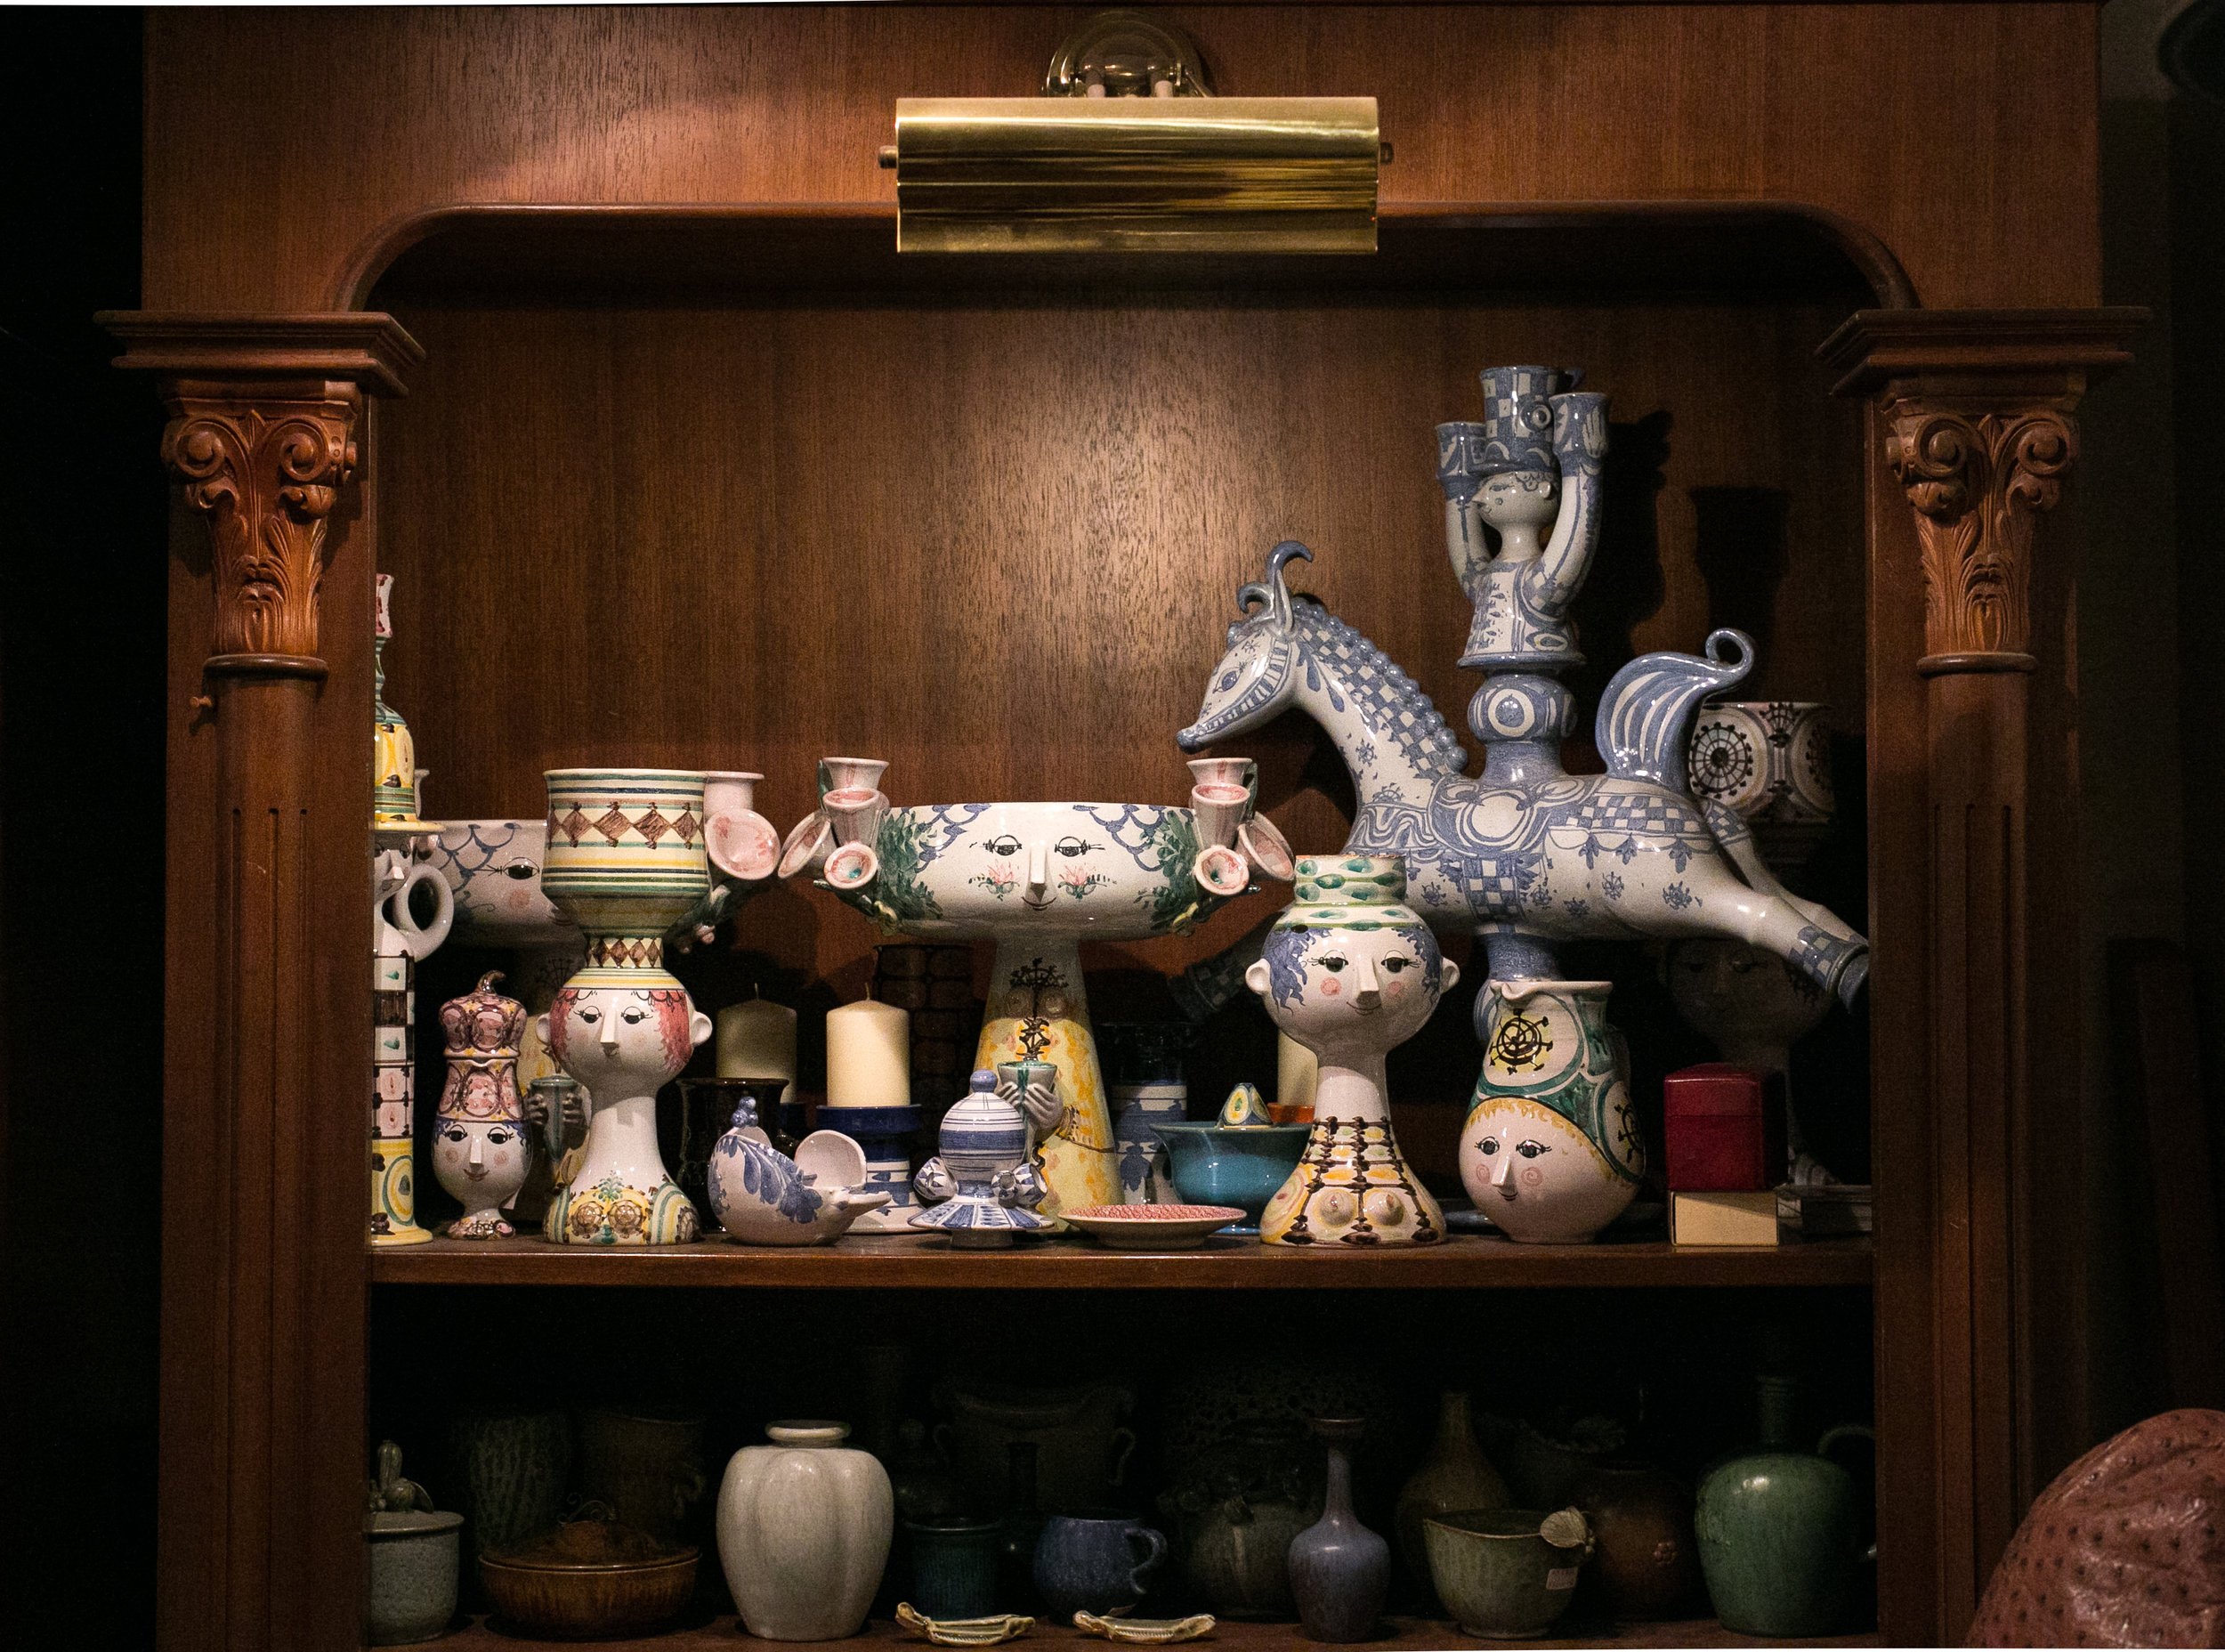 I en butik i Ginza-kvarteret i Tokyo, 2016. Foto: Ari Zelenko